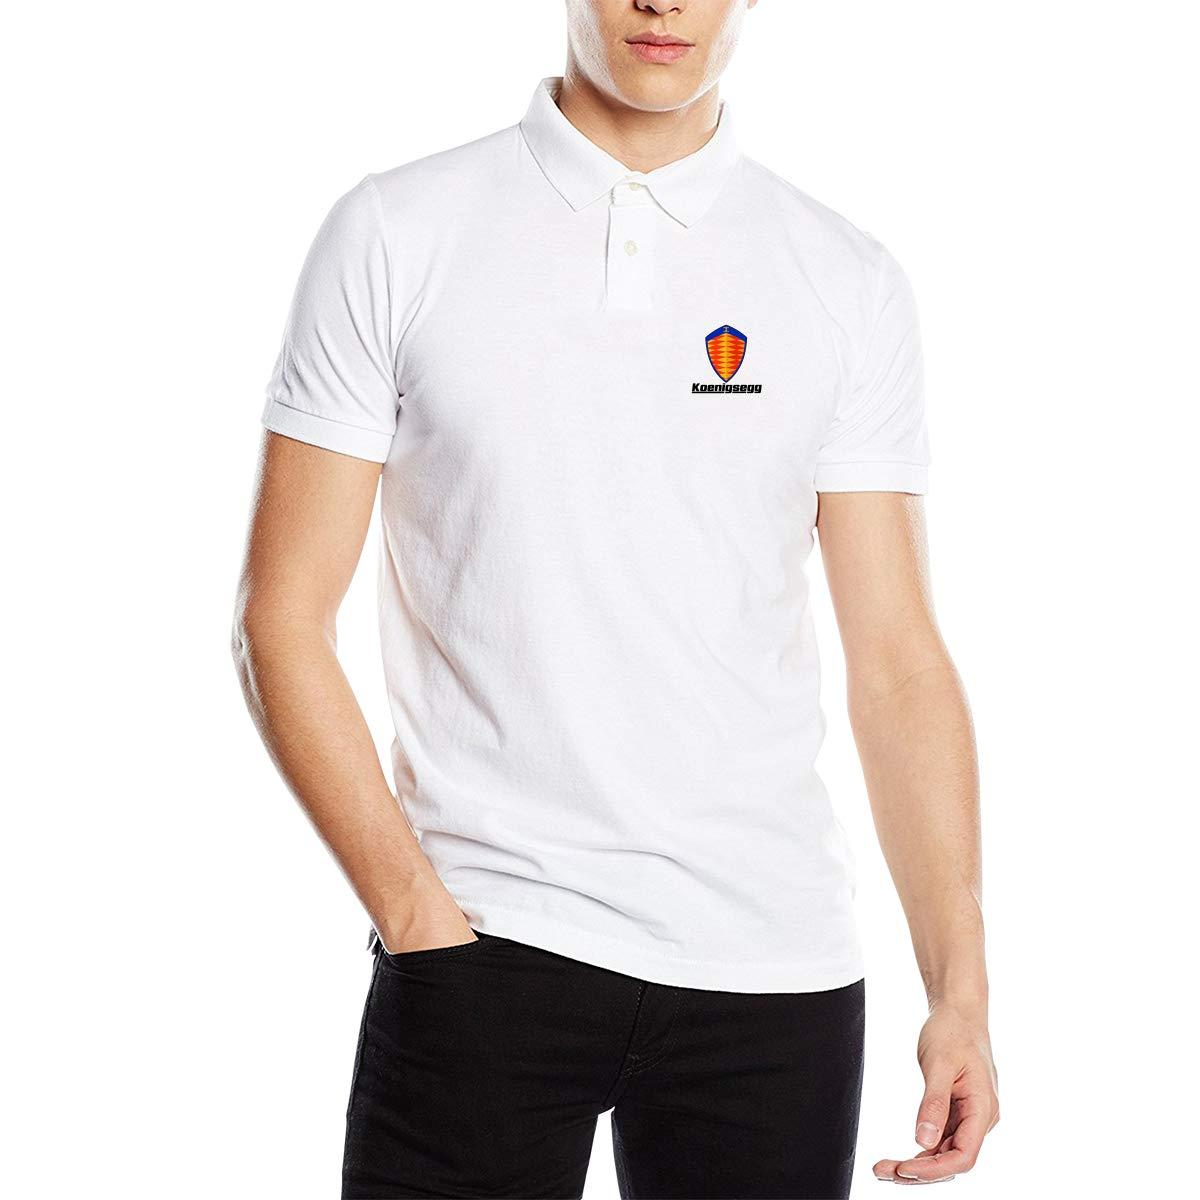 UESEU Personalized Koenigsegg Automotive AB Short Sleeve Classic Athletic Polo Shirt T-Shirts for Mens